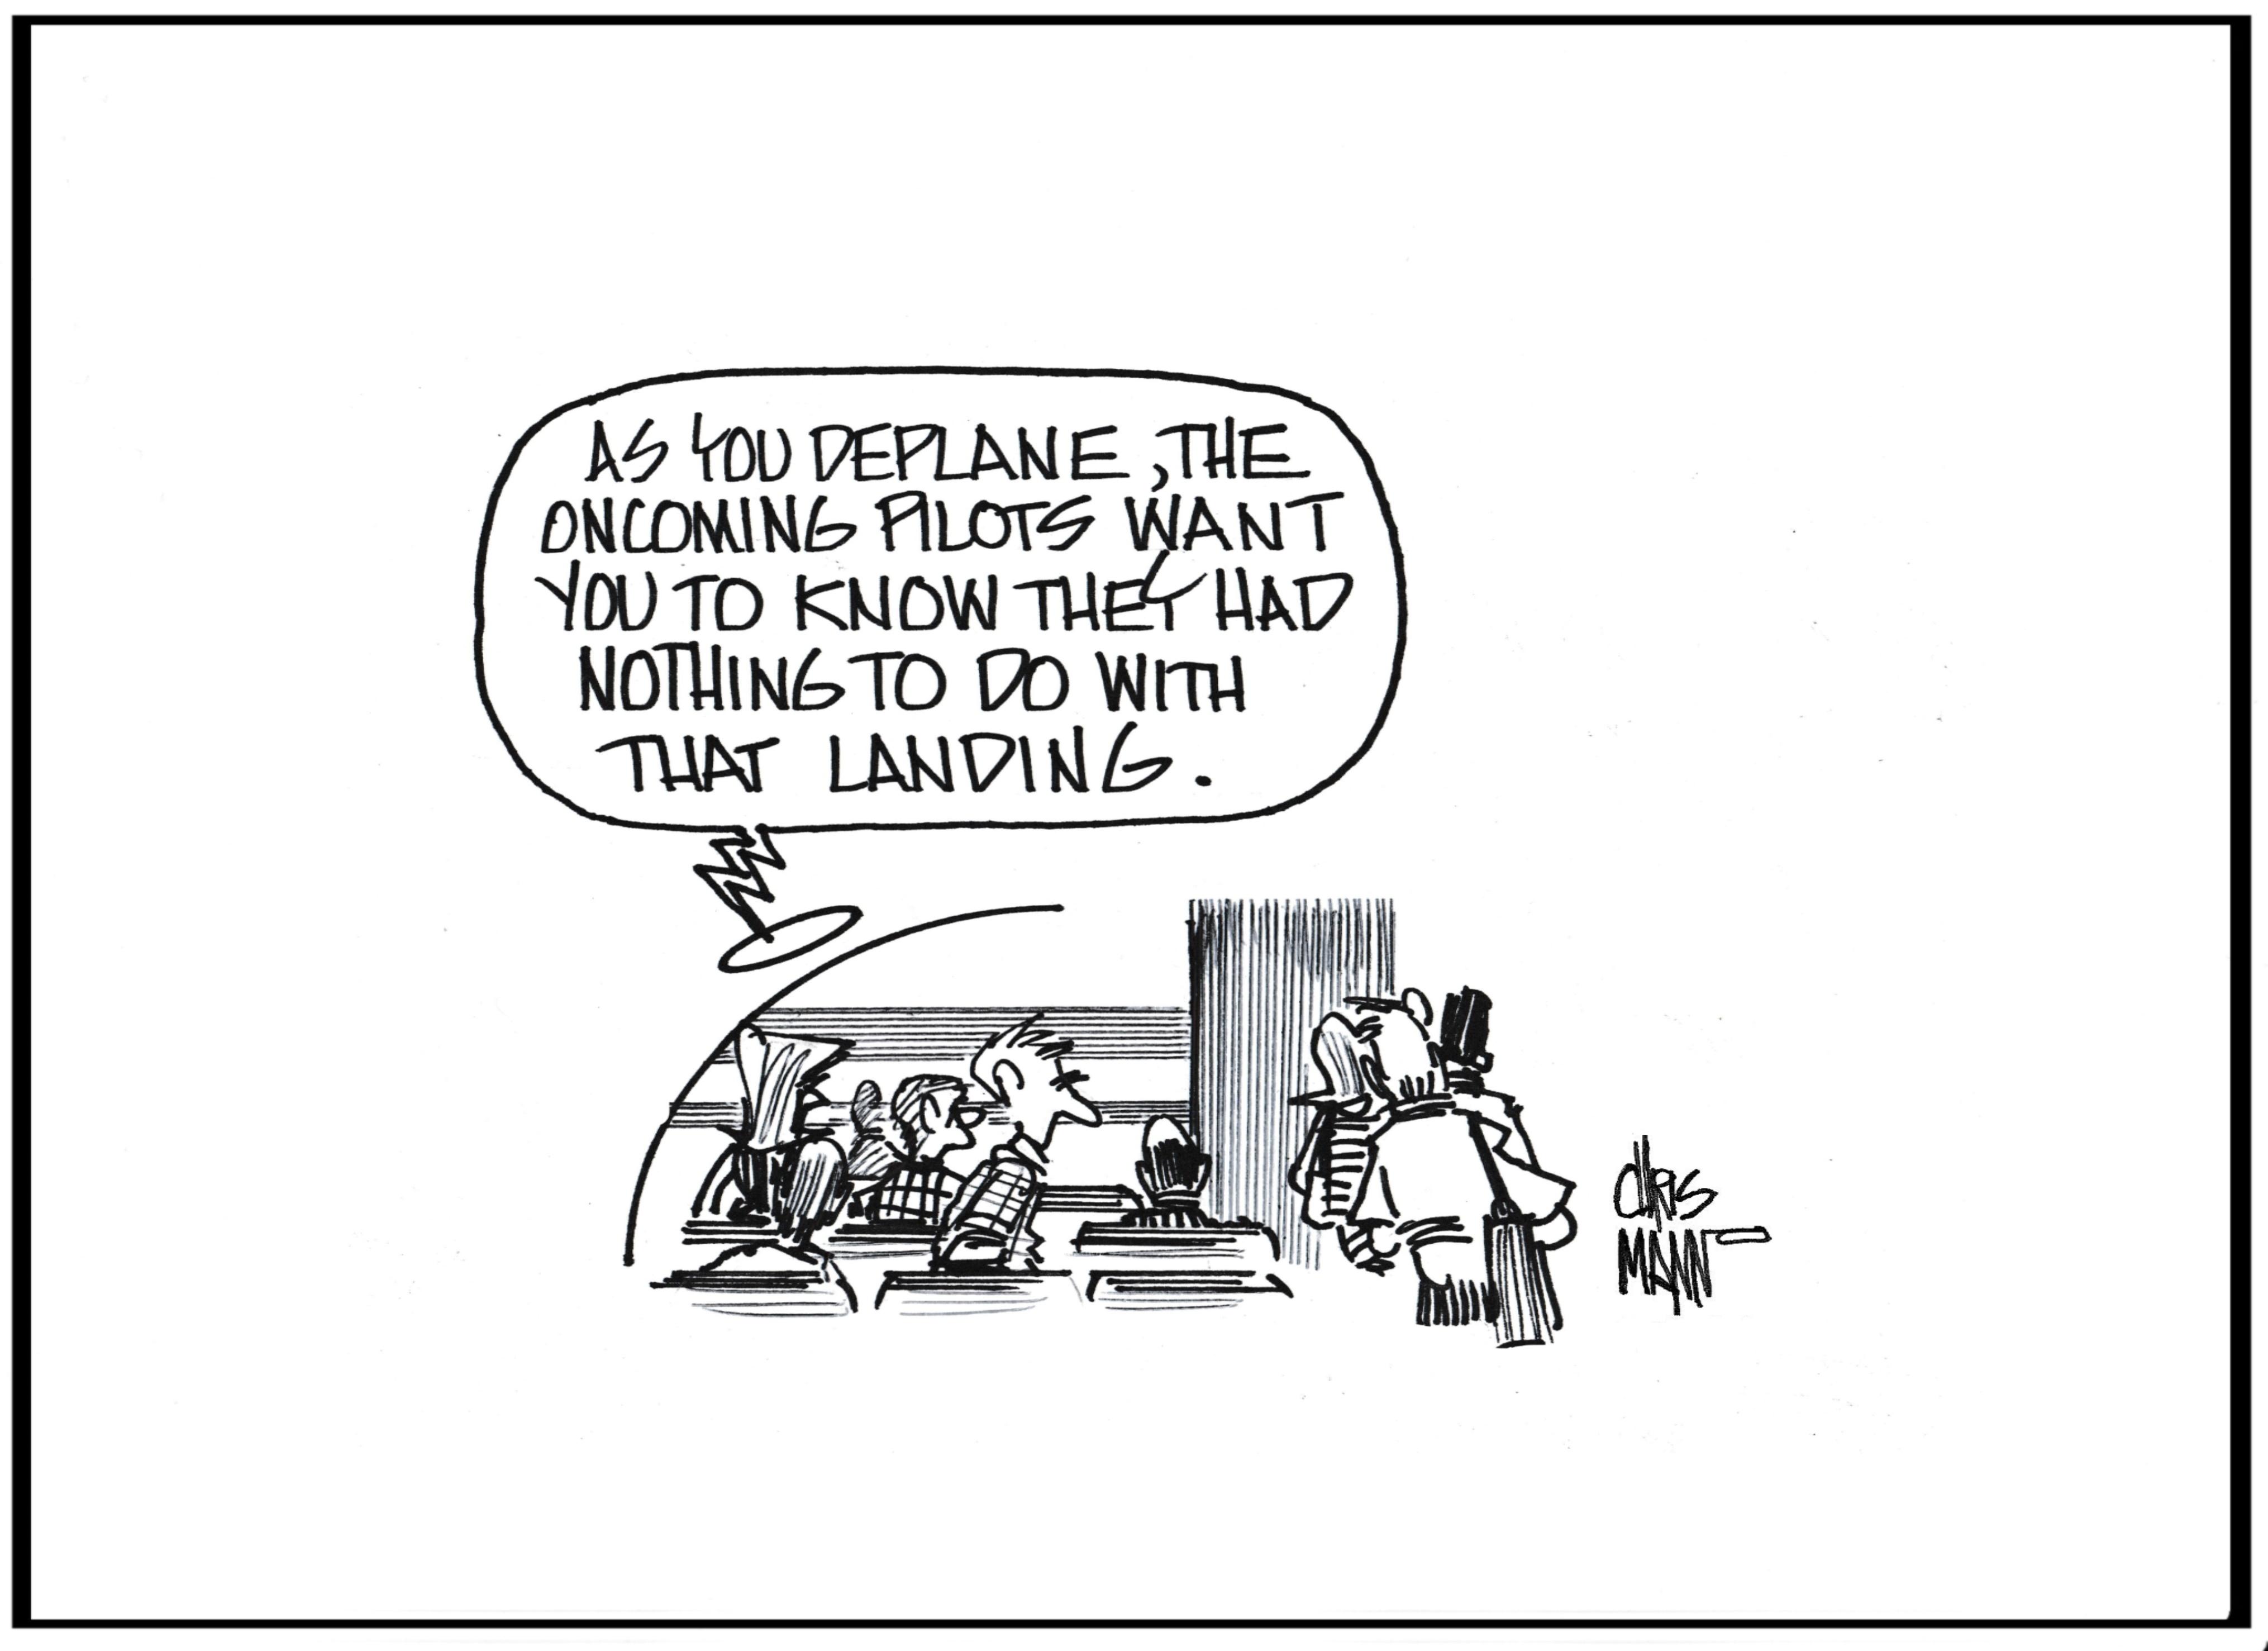 air pilots oncoming landing 001 (2)_LI